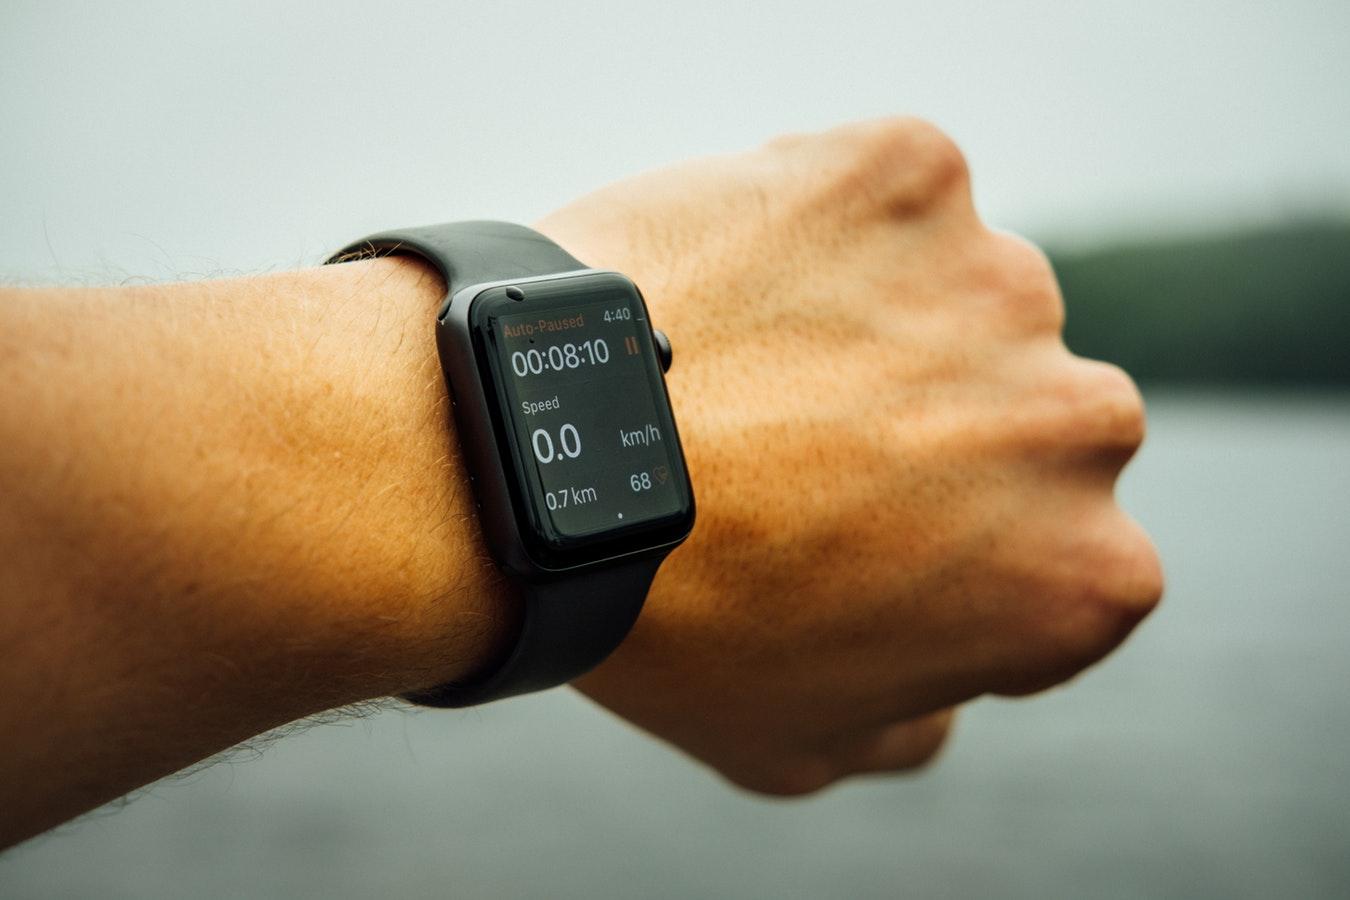 image of a man's wrist wearing an apple watch